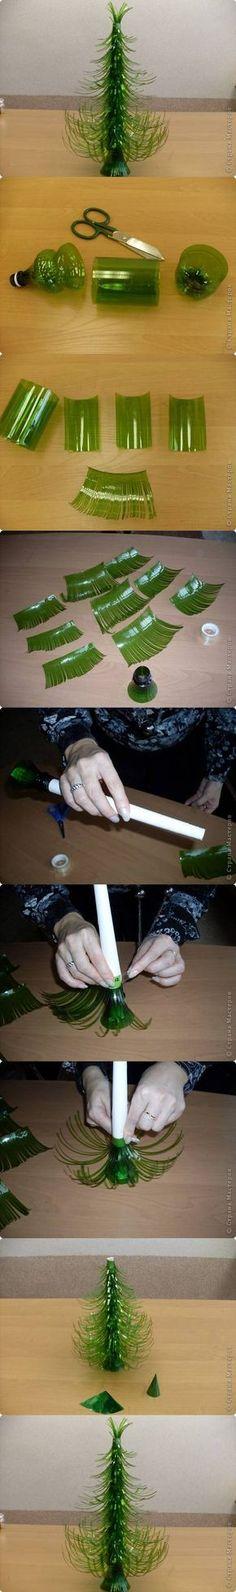 DIY : Faire un sapin de Noël avec des bouteilles en plastique. (http://cafeypuntadas.blogspot.fr/2013/11/a-reciclar-se-ha-dicho.html) Más